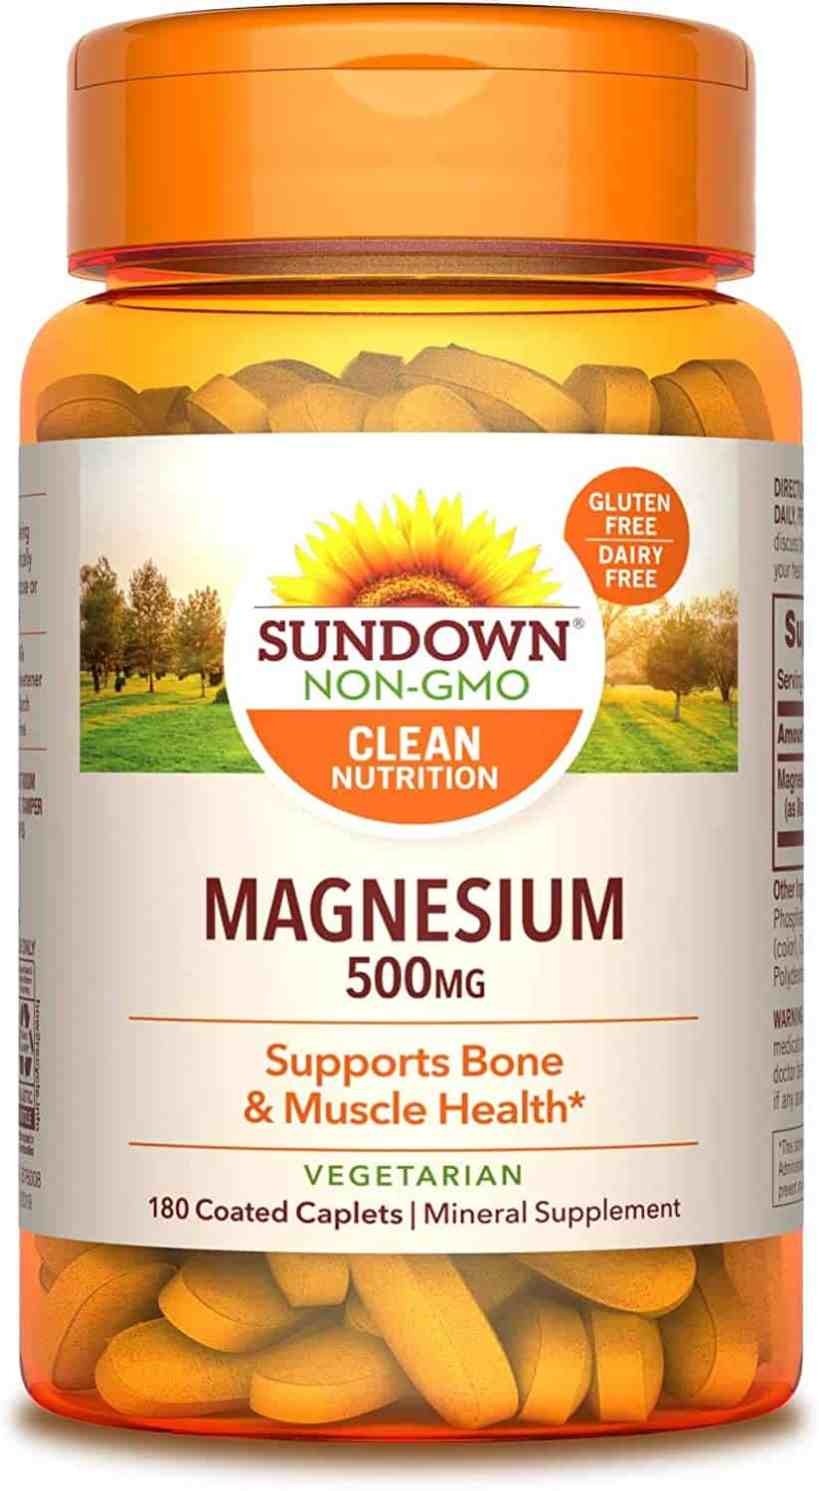 Sundown Magnesium